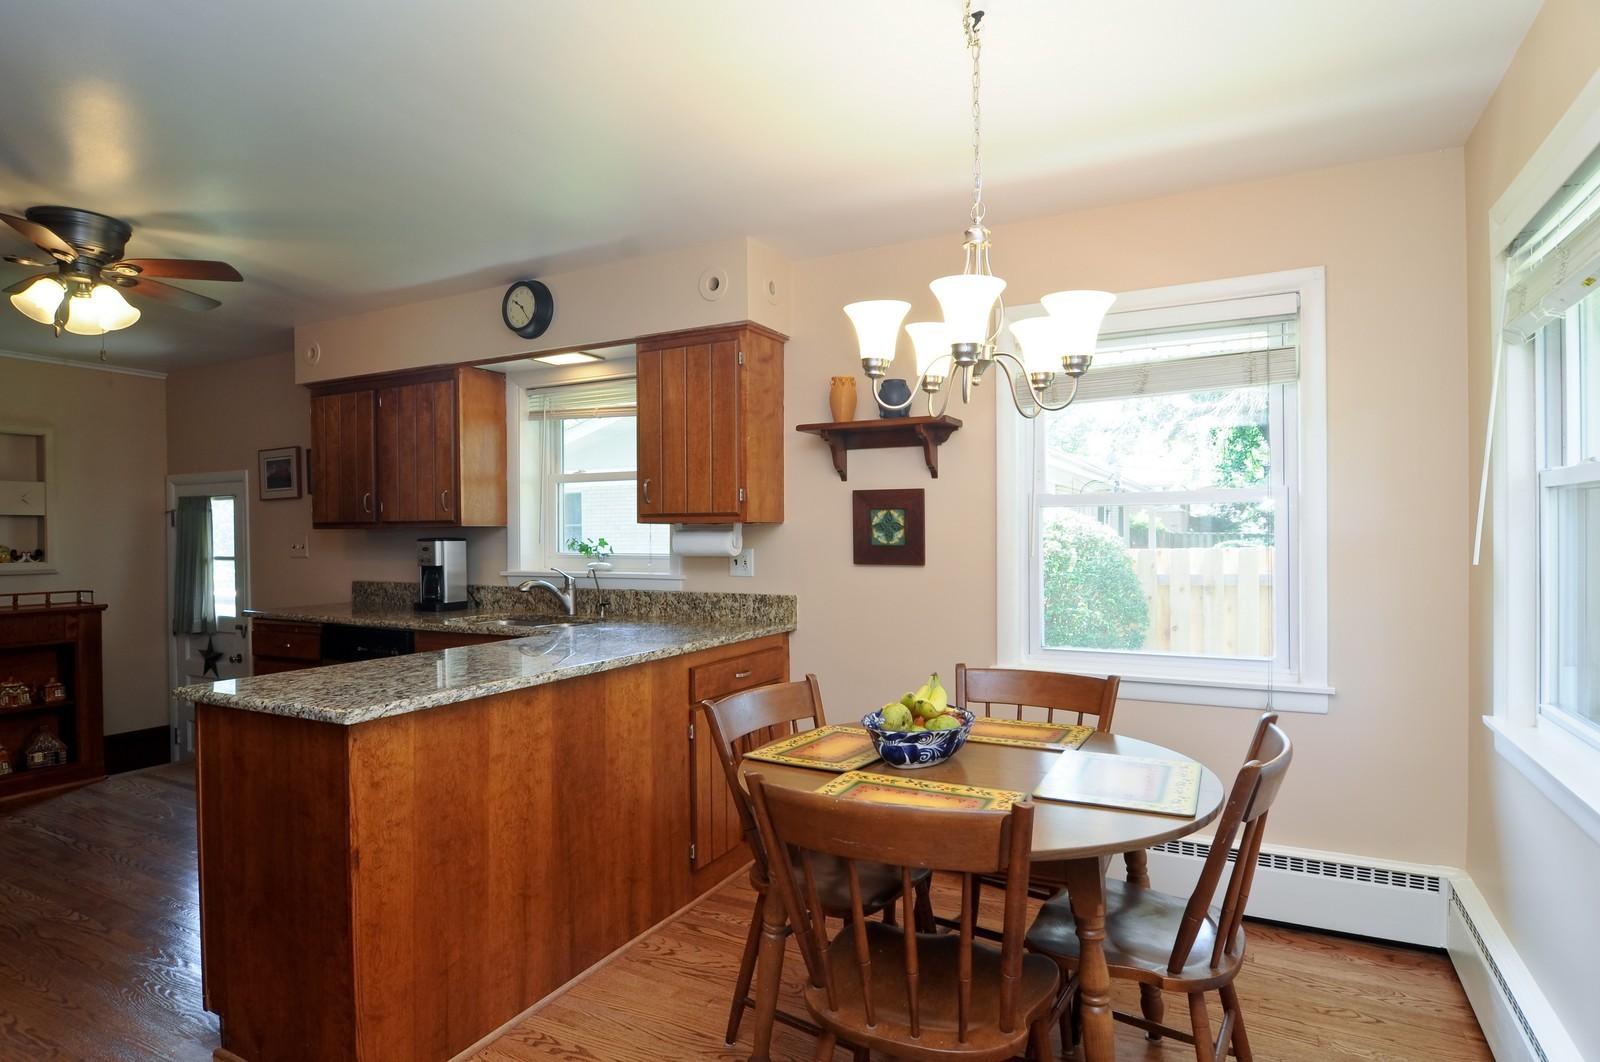 Real Estate Photography - 240 Sharon Dr, Barrington, IL, 60010 - Kitchen / Breakfast Room